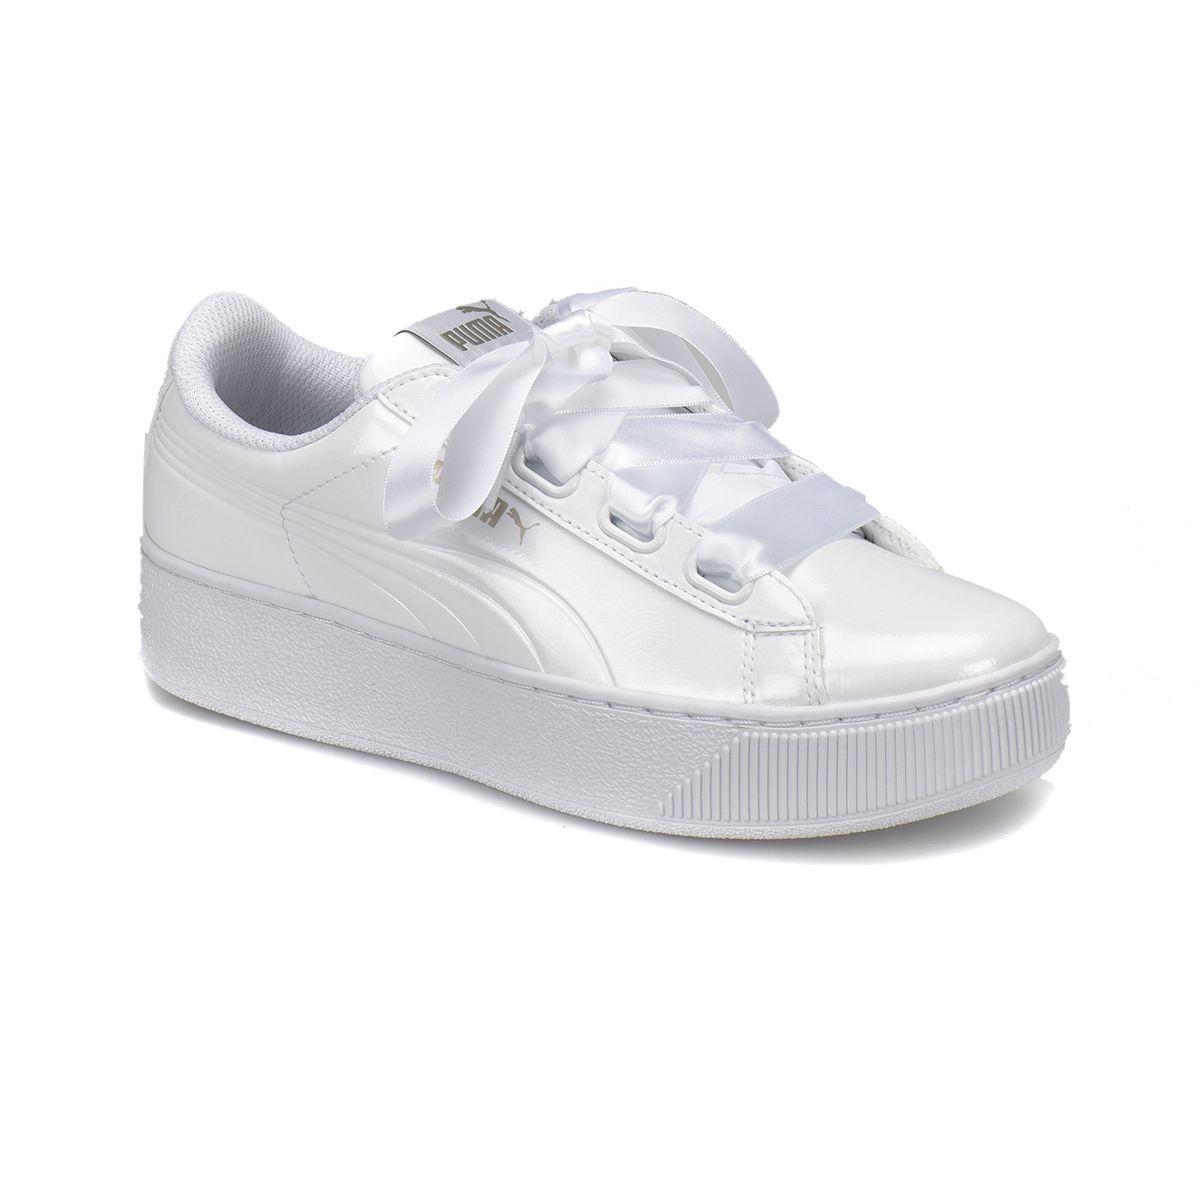 Puma - Puma PUMA VIKKY RIBBON P Beyaz Kadın Deri Sneaker - FLO Ayakkabı